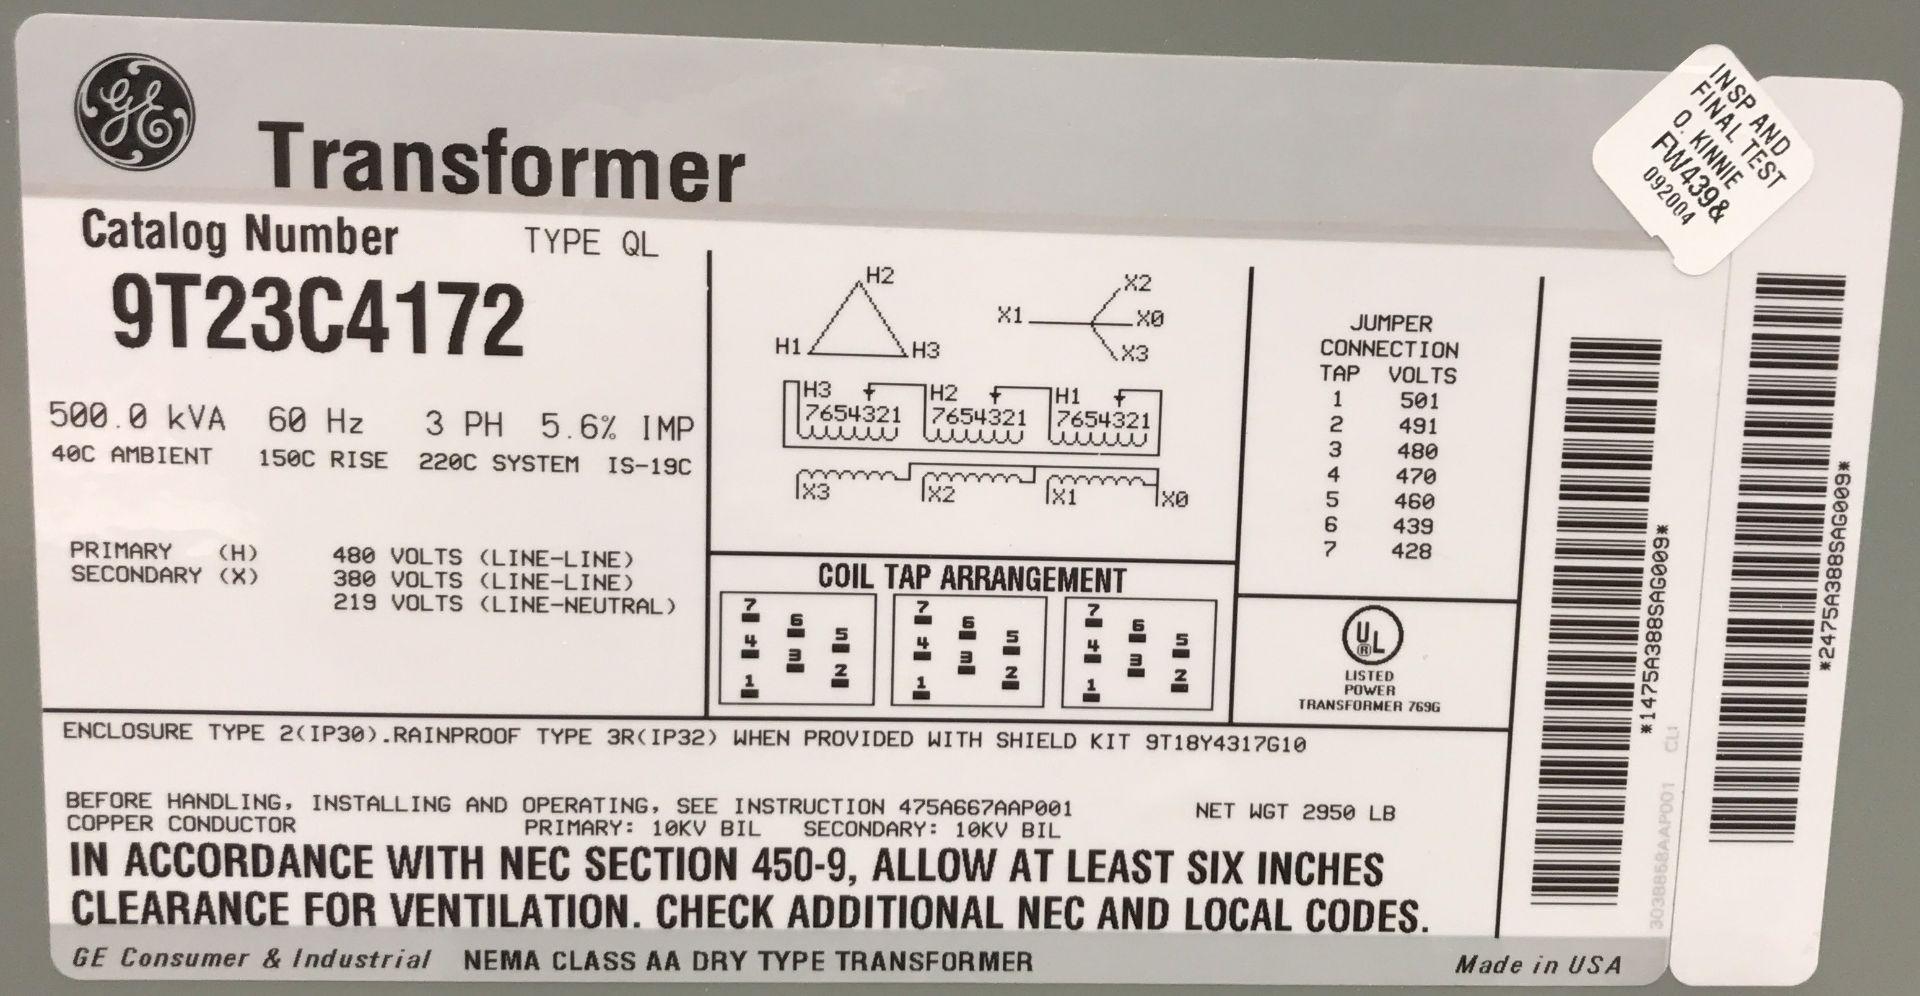 GE TRANSFORMER 500 KVA, 480V/219V, 3 PHASE [RIGGING FEES FOR LOT# 36 - $50 USD PLUS APPLICABLE - Image 2 of 2